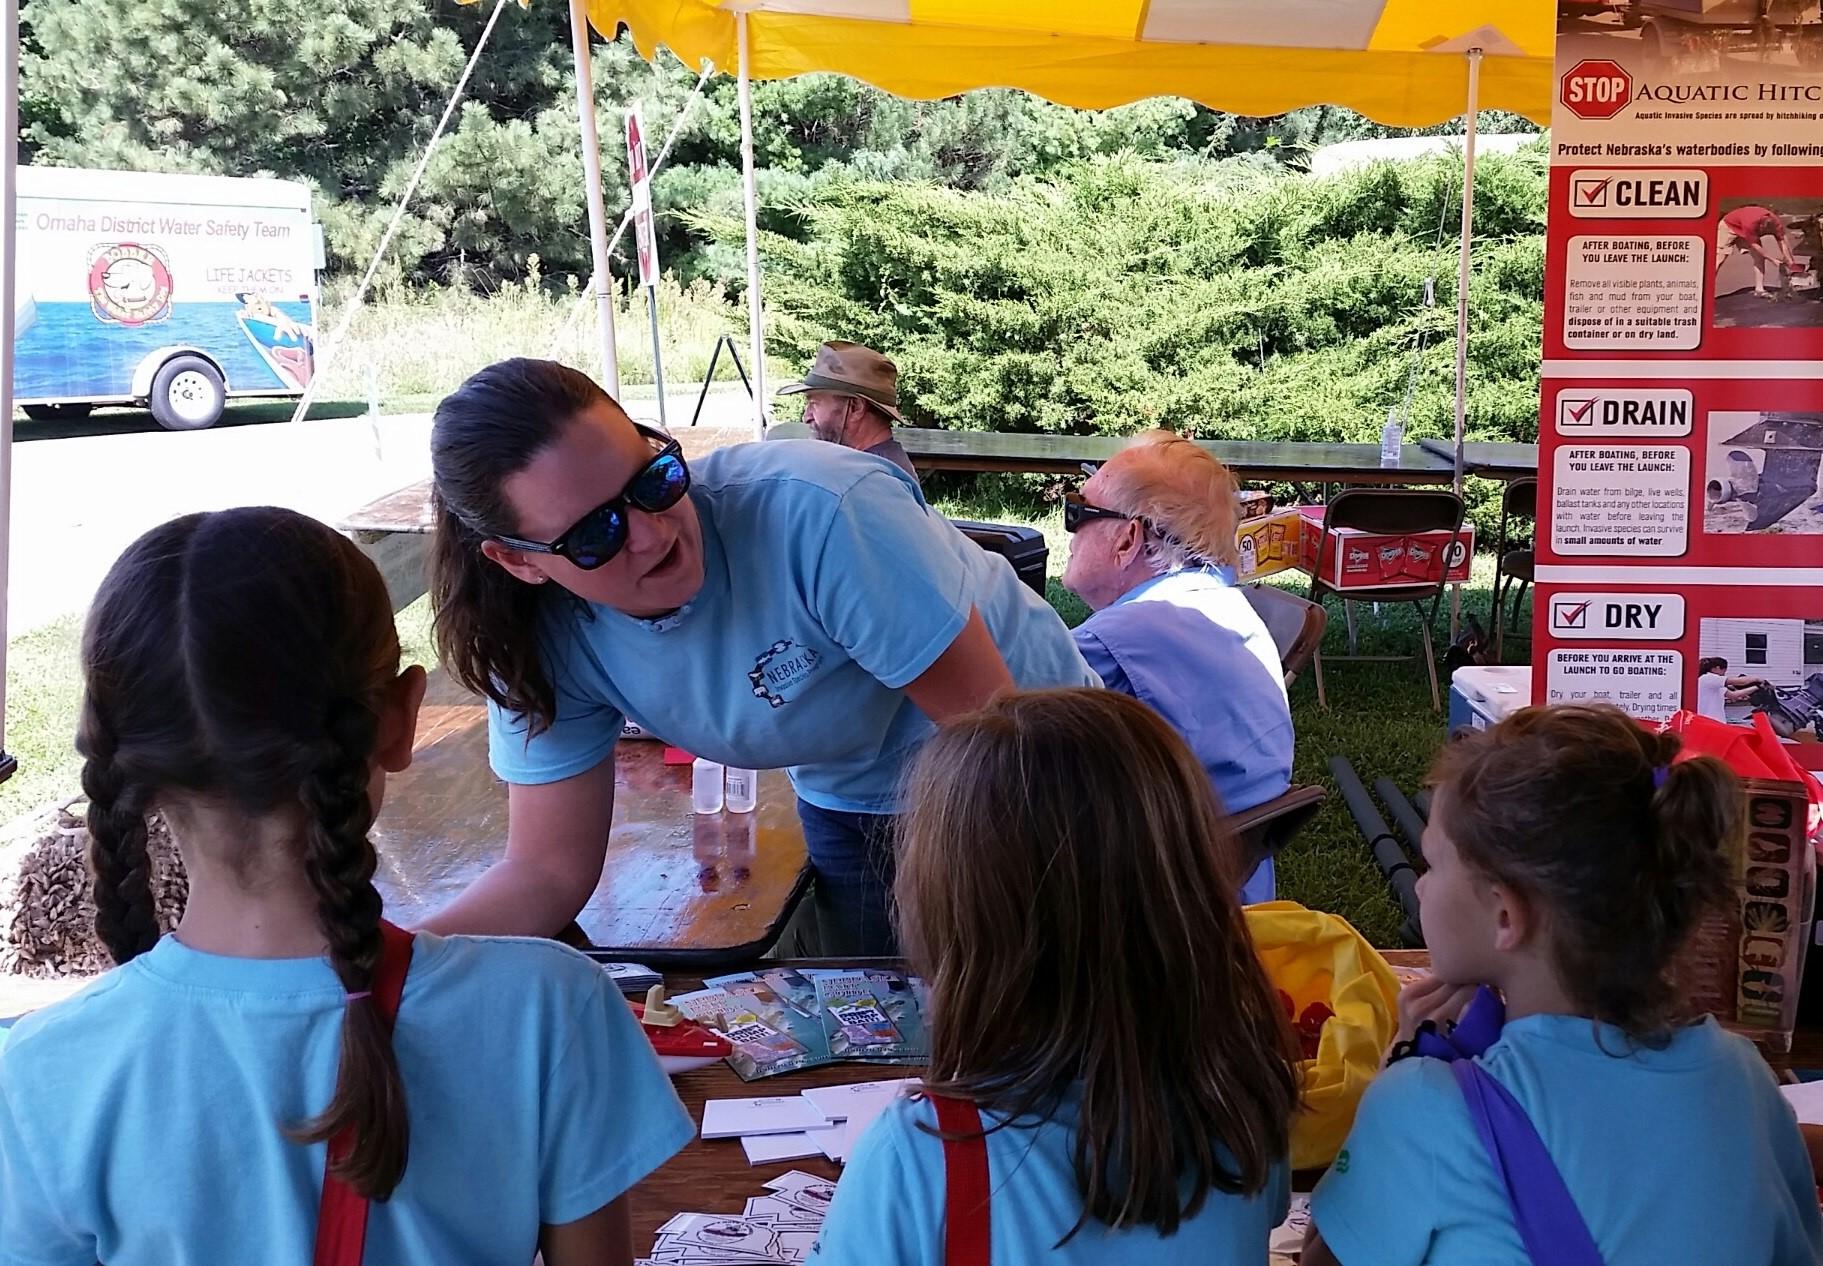 2016 lakeside outreach event. Photo: Allison Zach